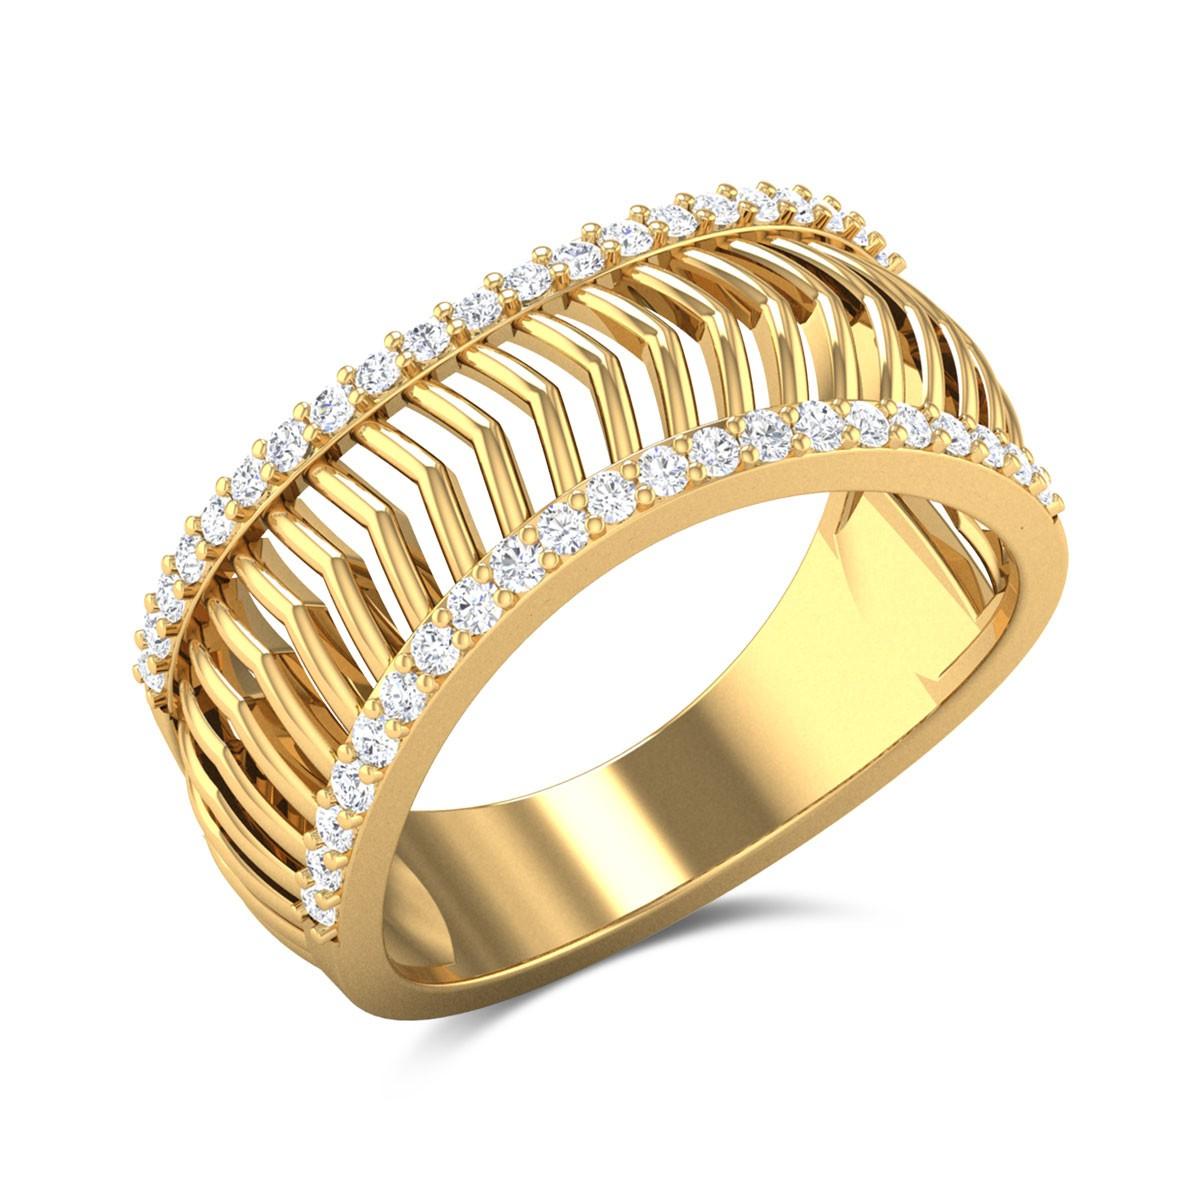 Sharina Diamond Ring